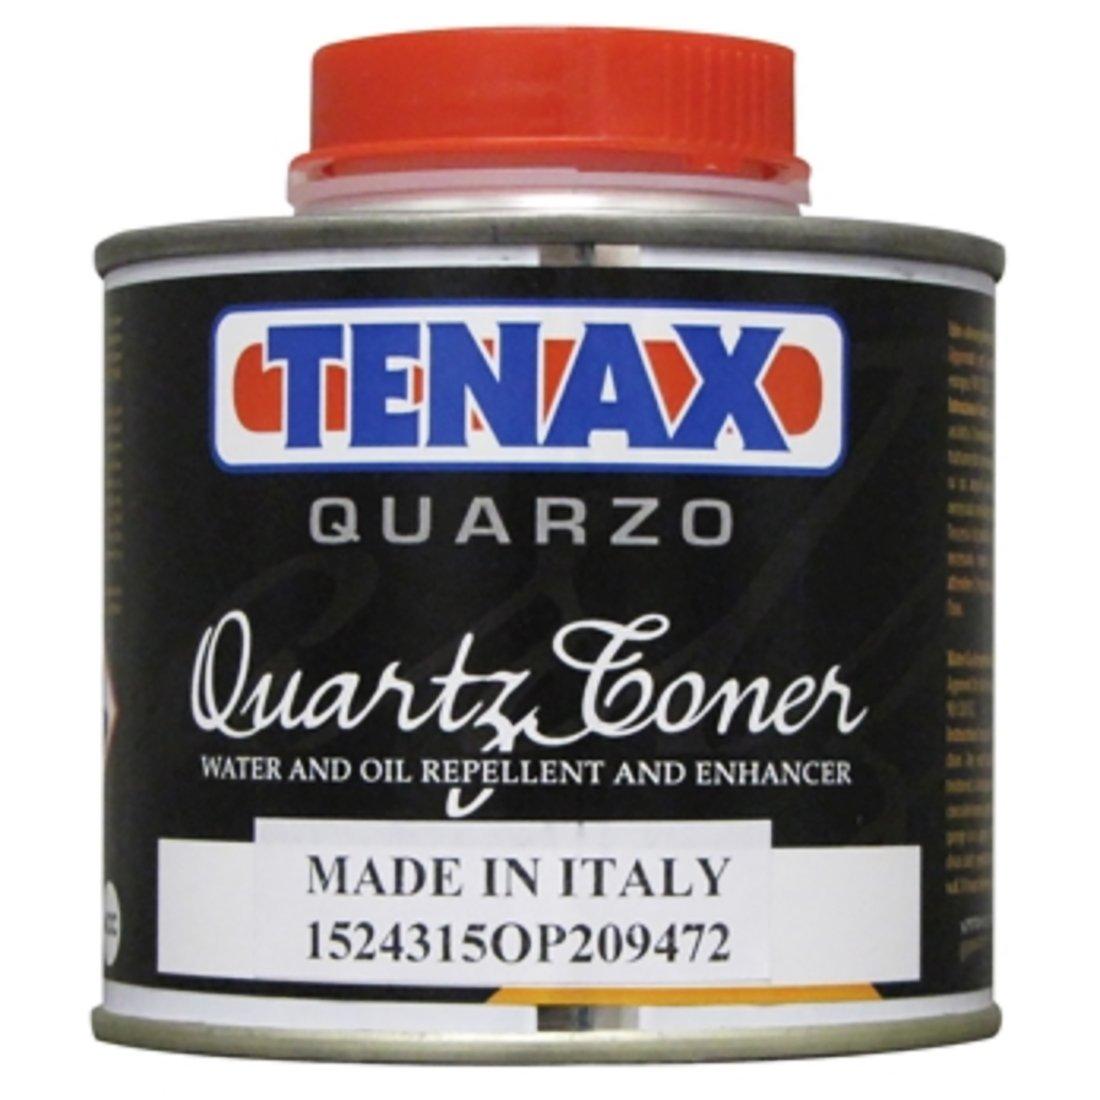 Tenax Quartz Toner - 250 mL by Tenax